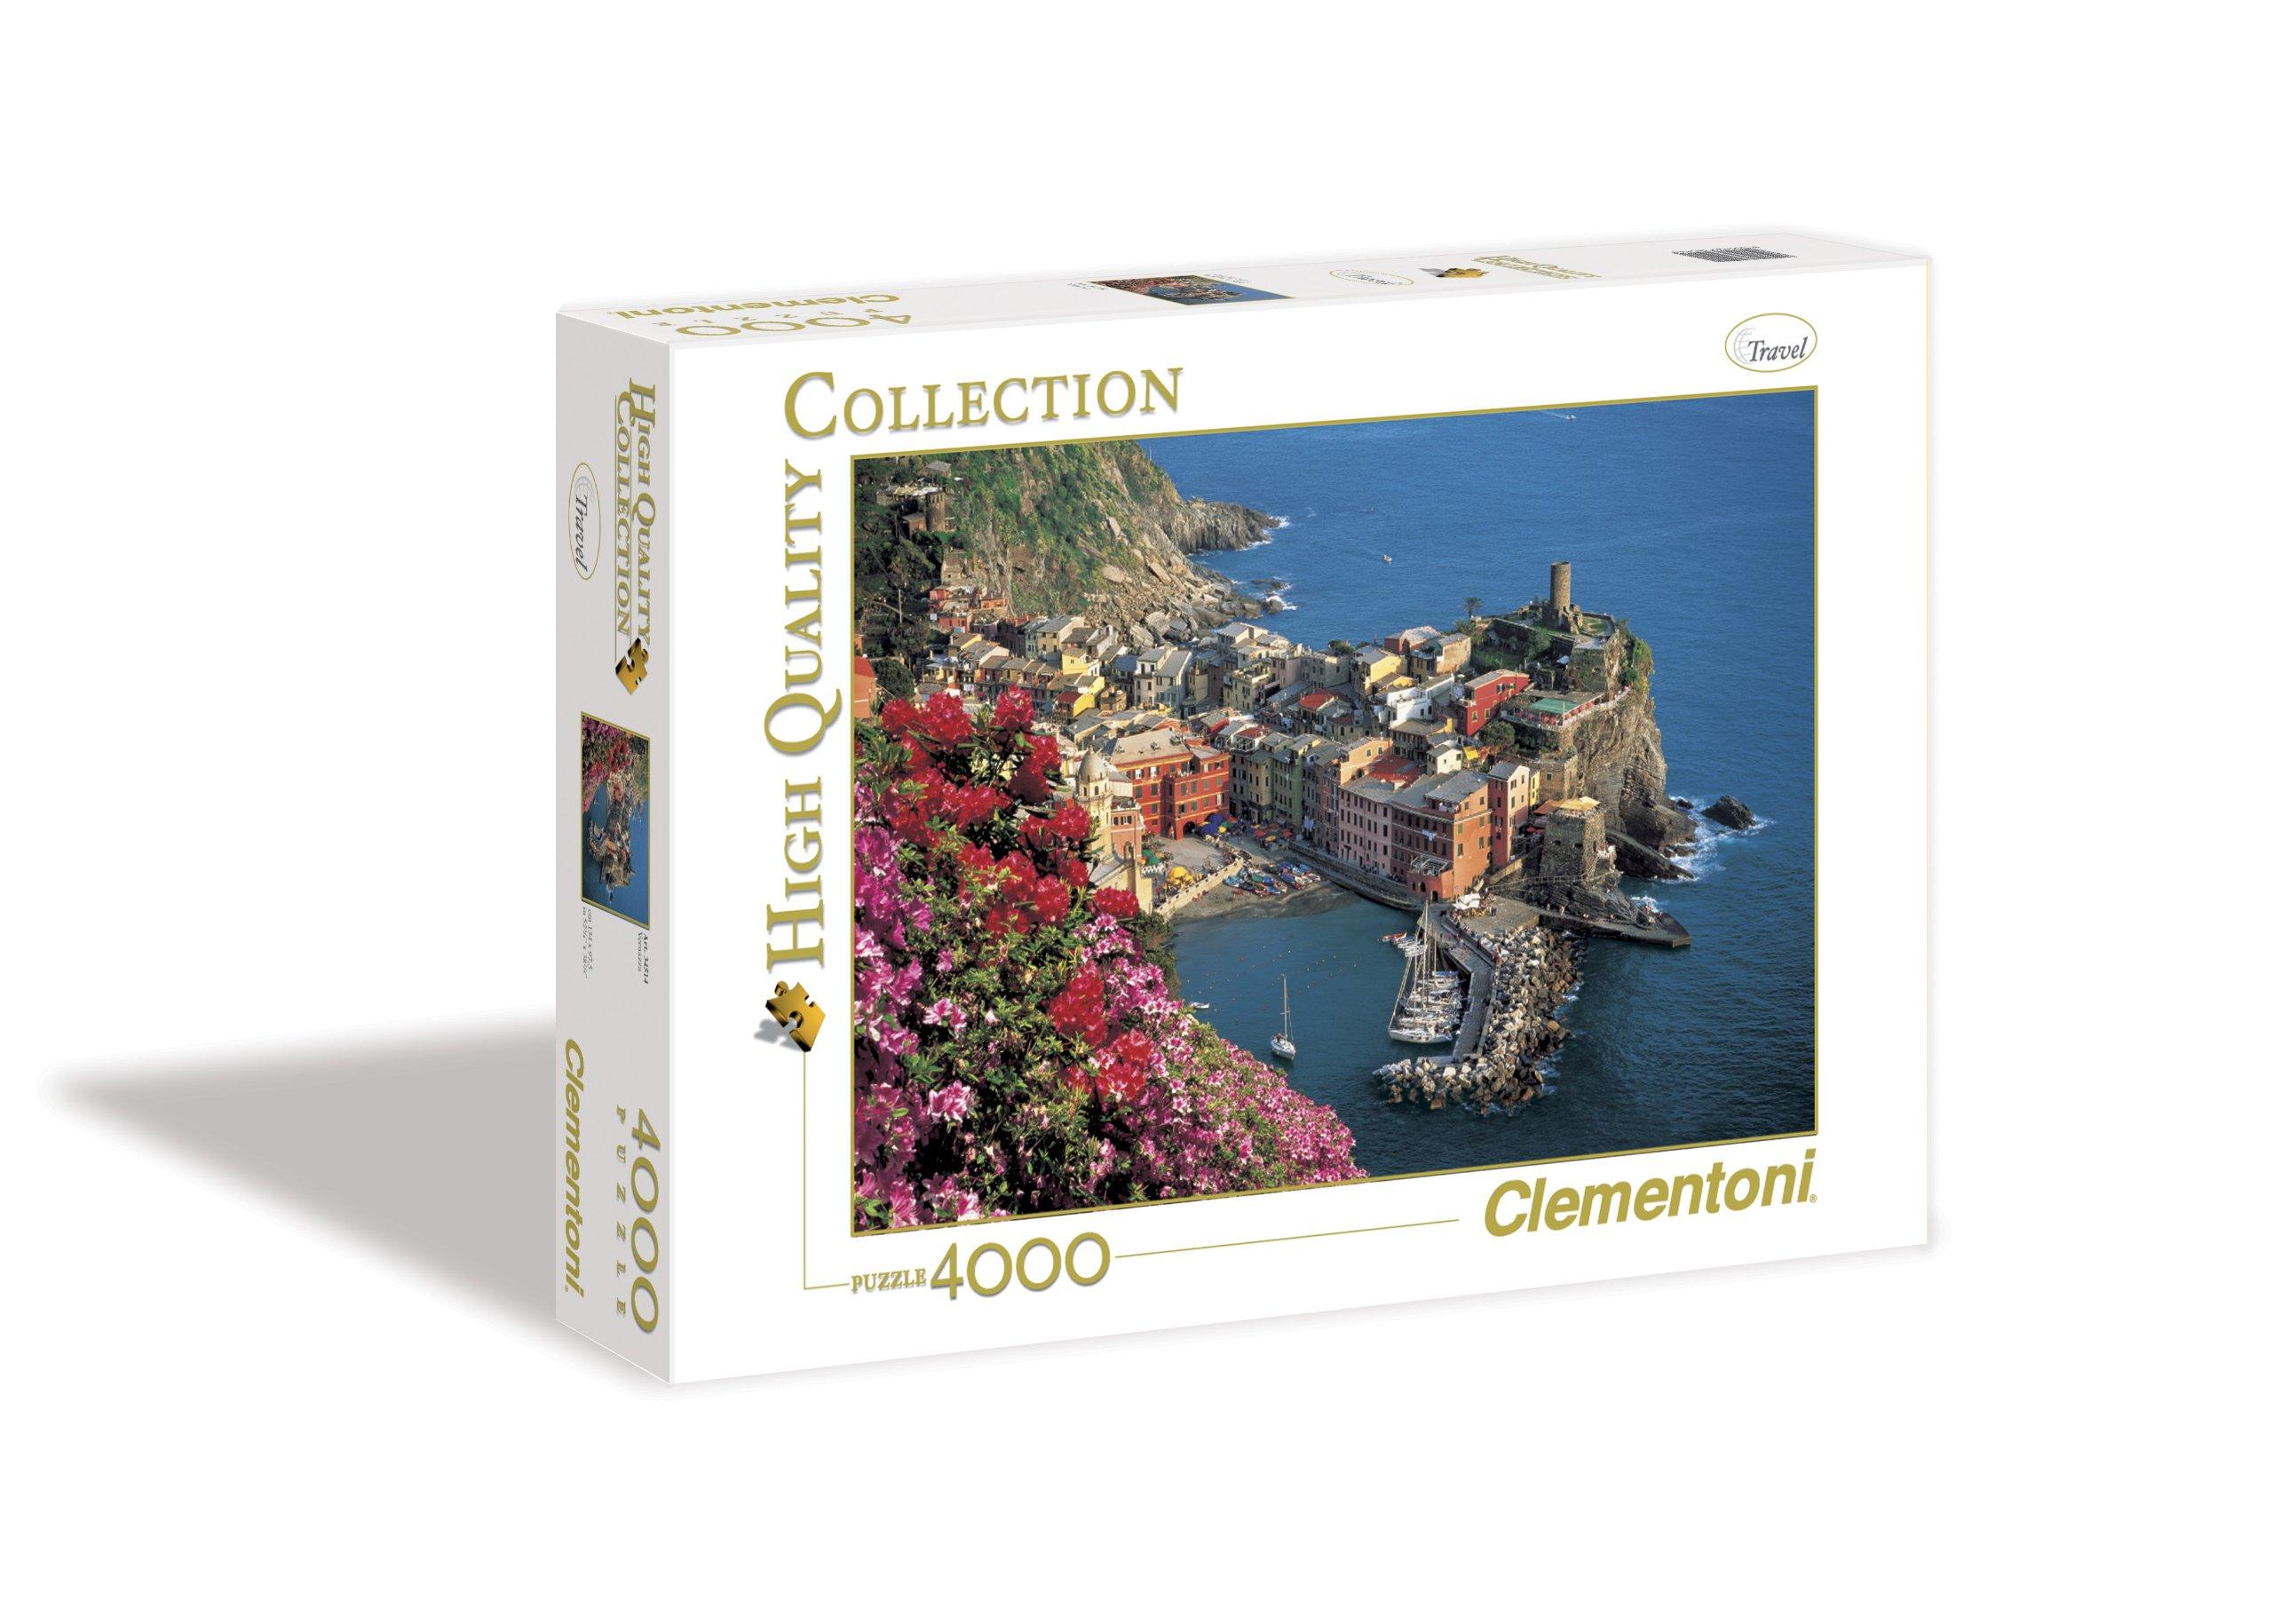 Clementoni Vernazza 4000 Piece Jigsaw Puzzle by Clementoni (Image #1)